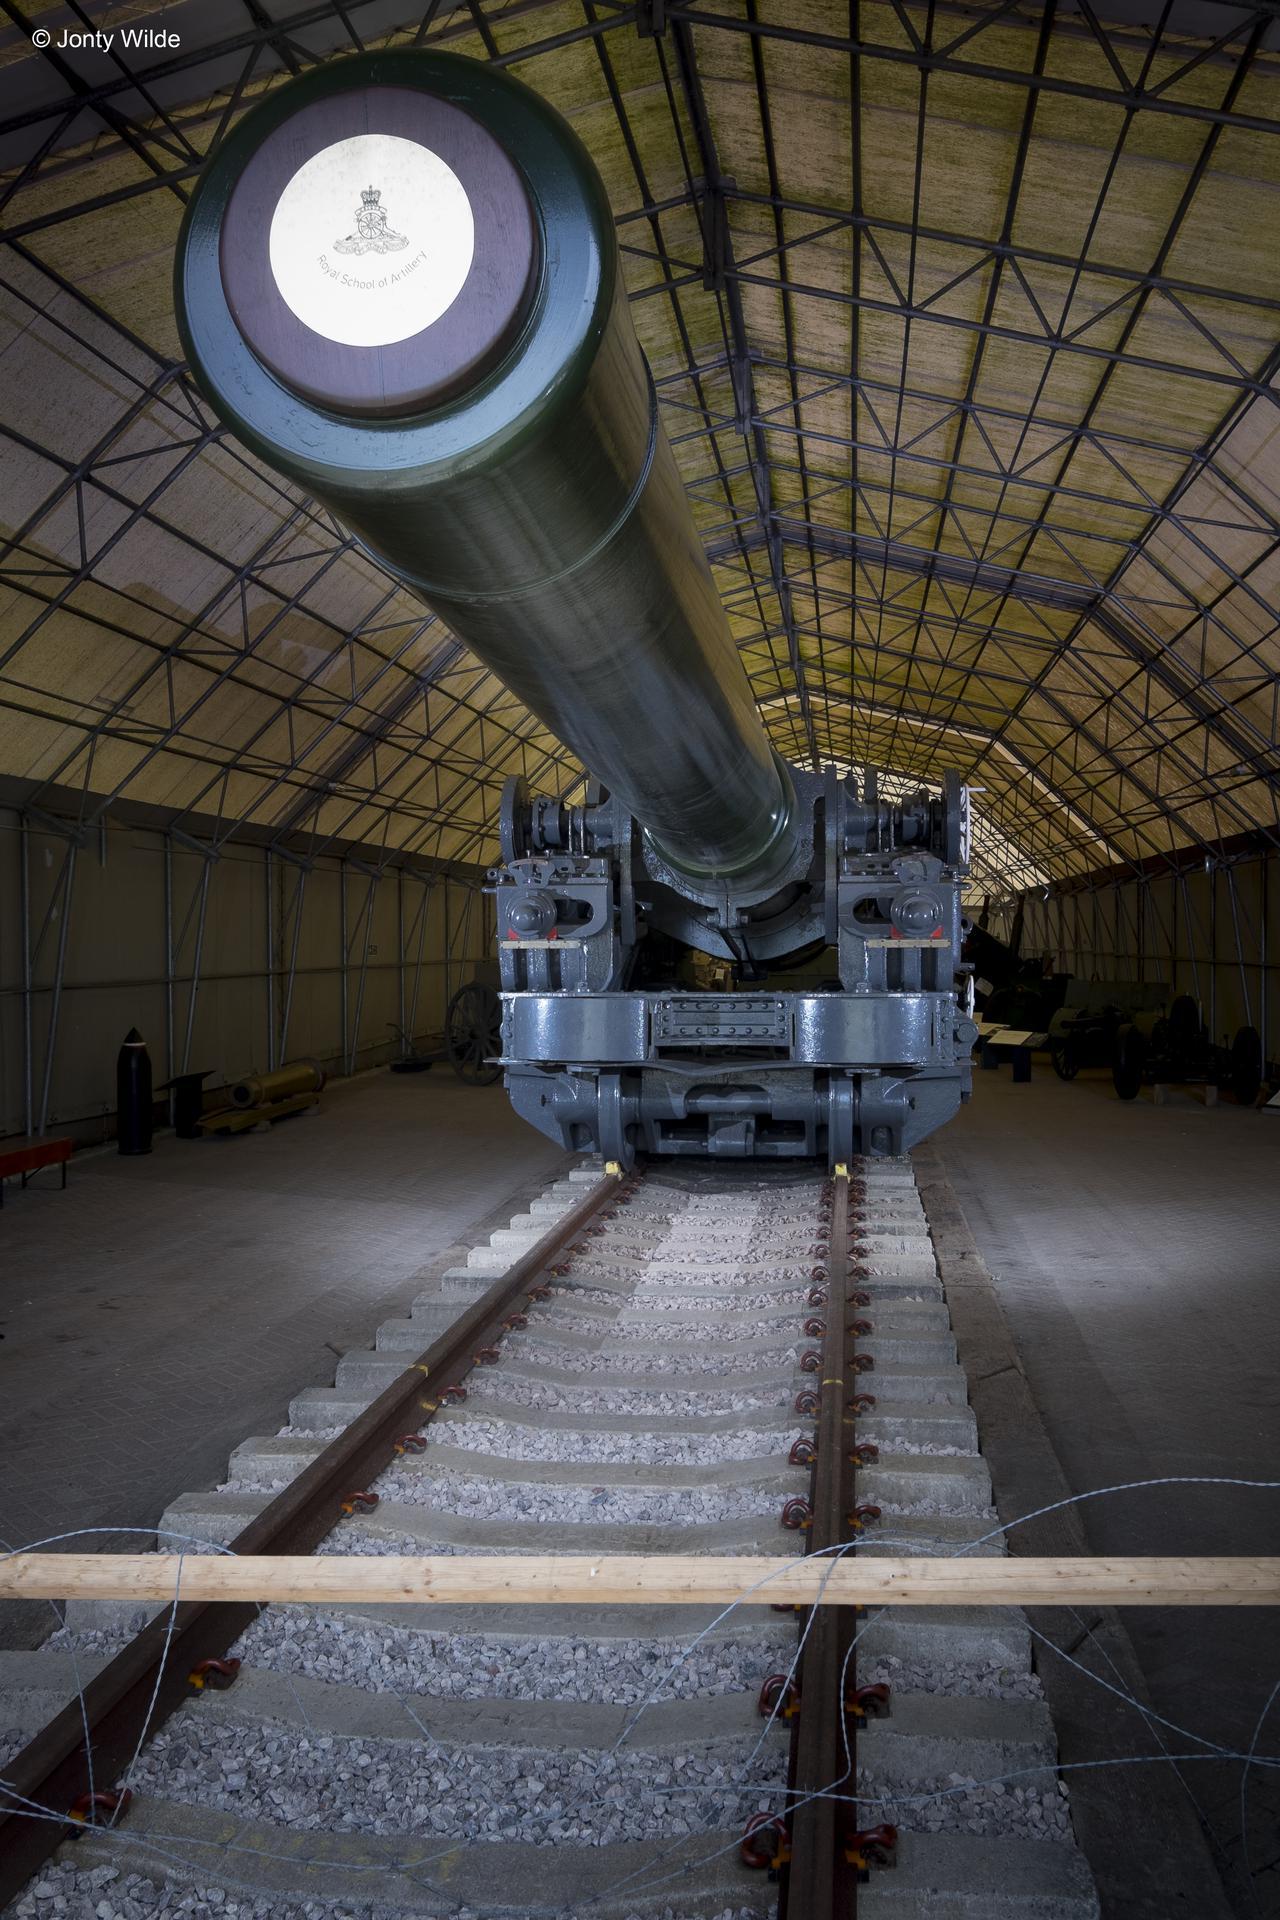 Gun - Ordnance, Breech-Loading, 18-inch Howitzer, Mark I on Railway Proof Sleigh Mark I